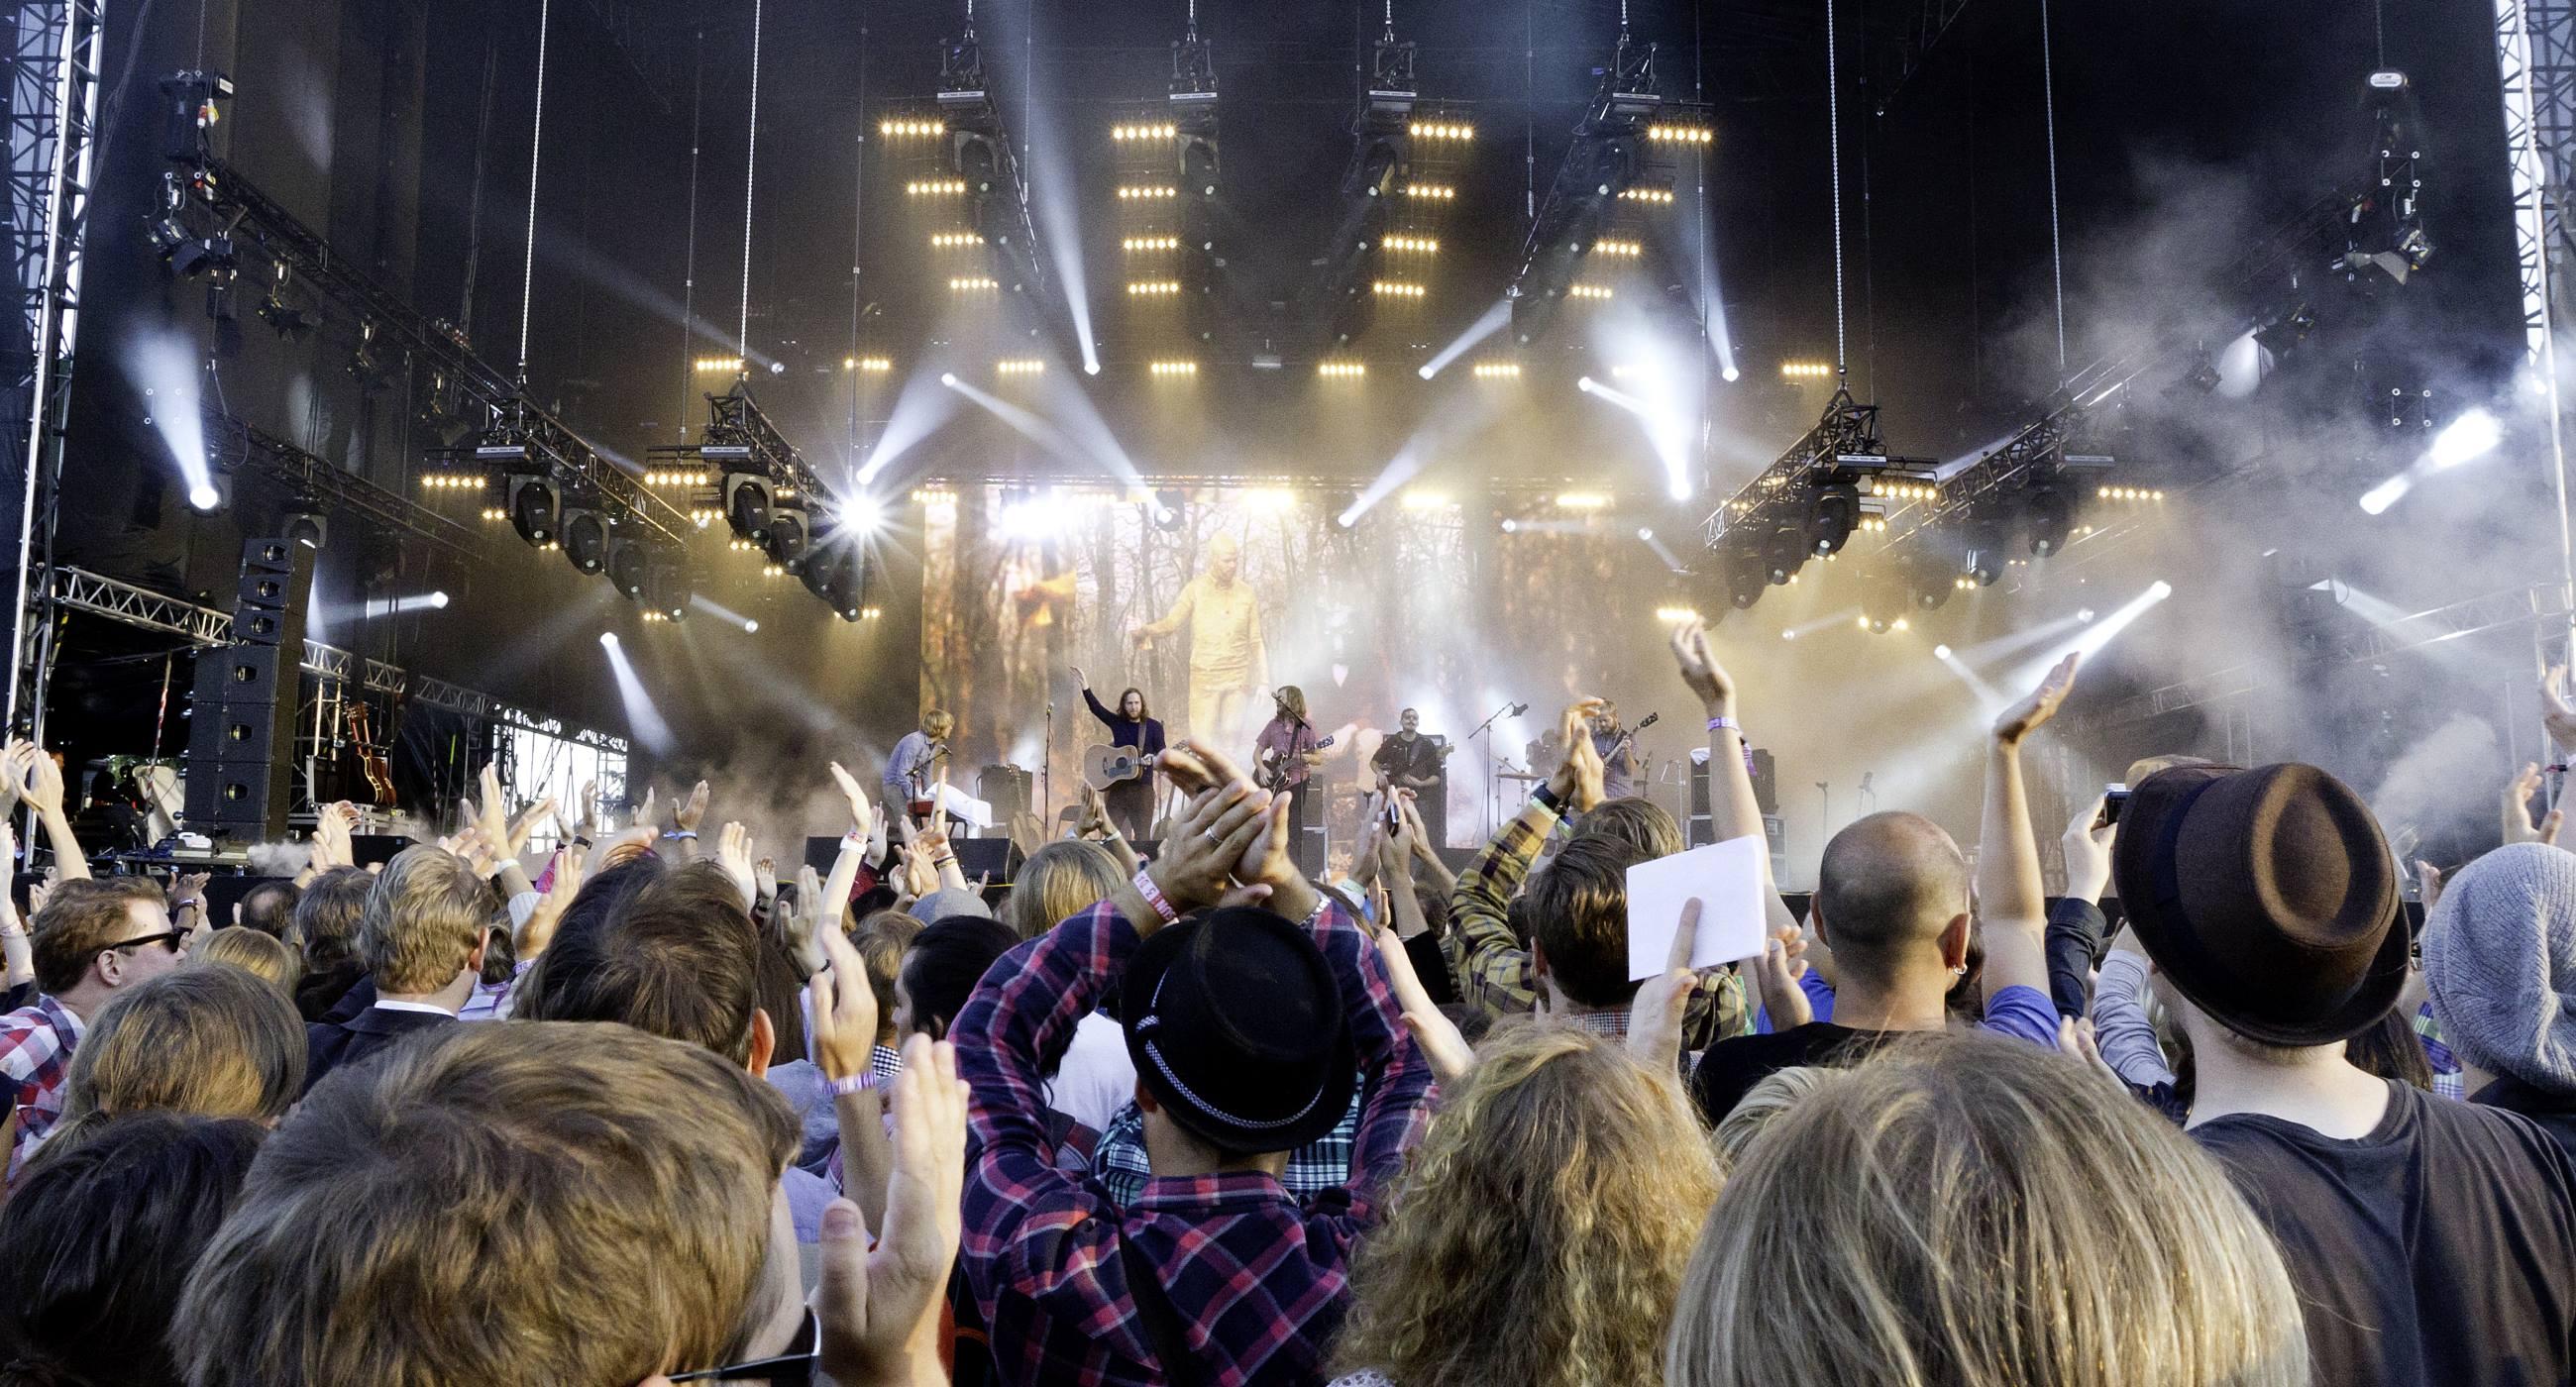 Flow-Festival-in-Finland-Makes-Magic-Happen